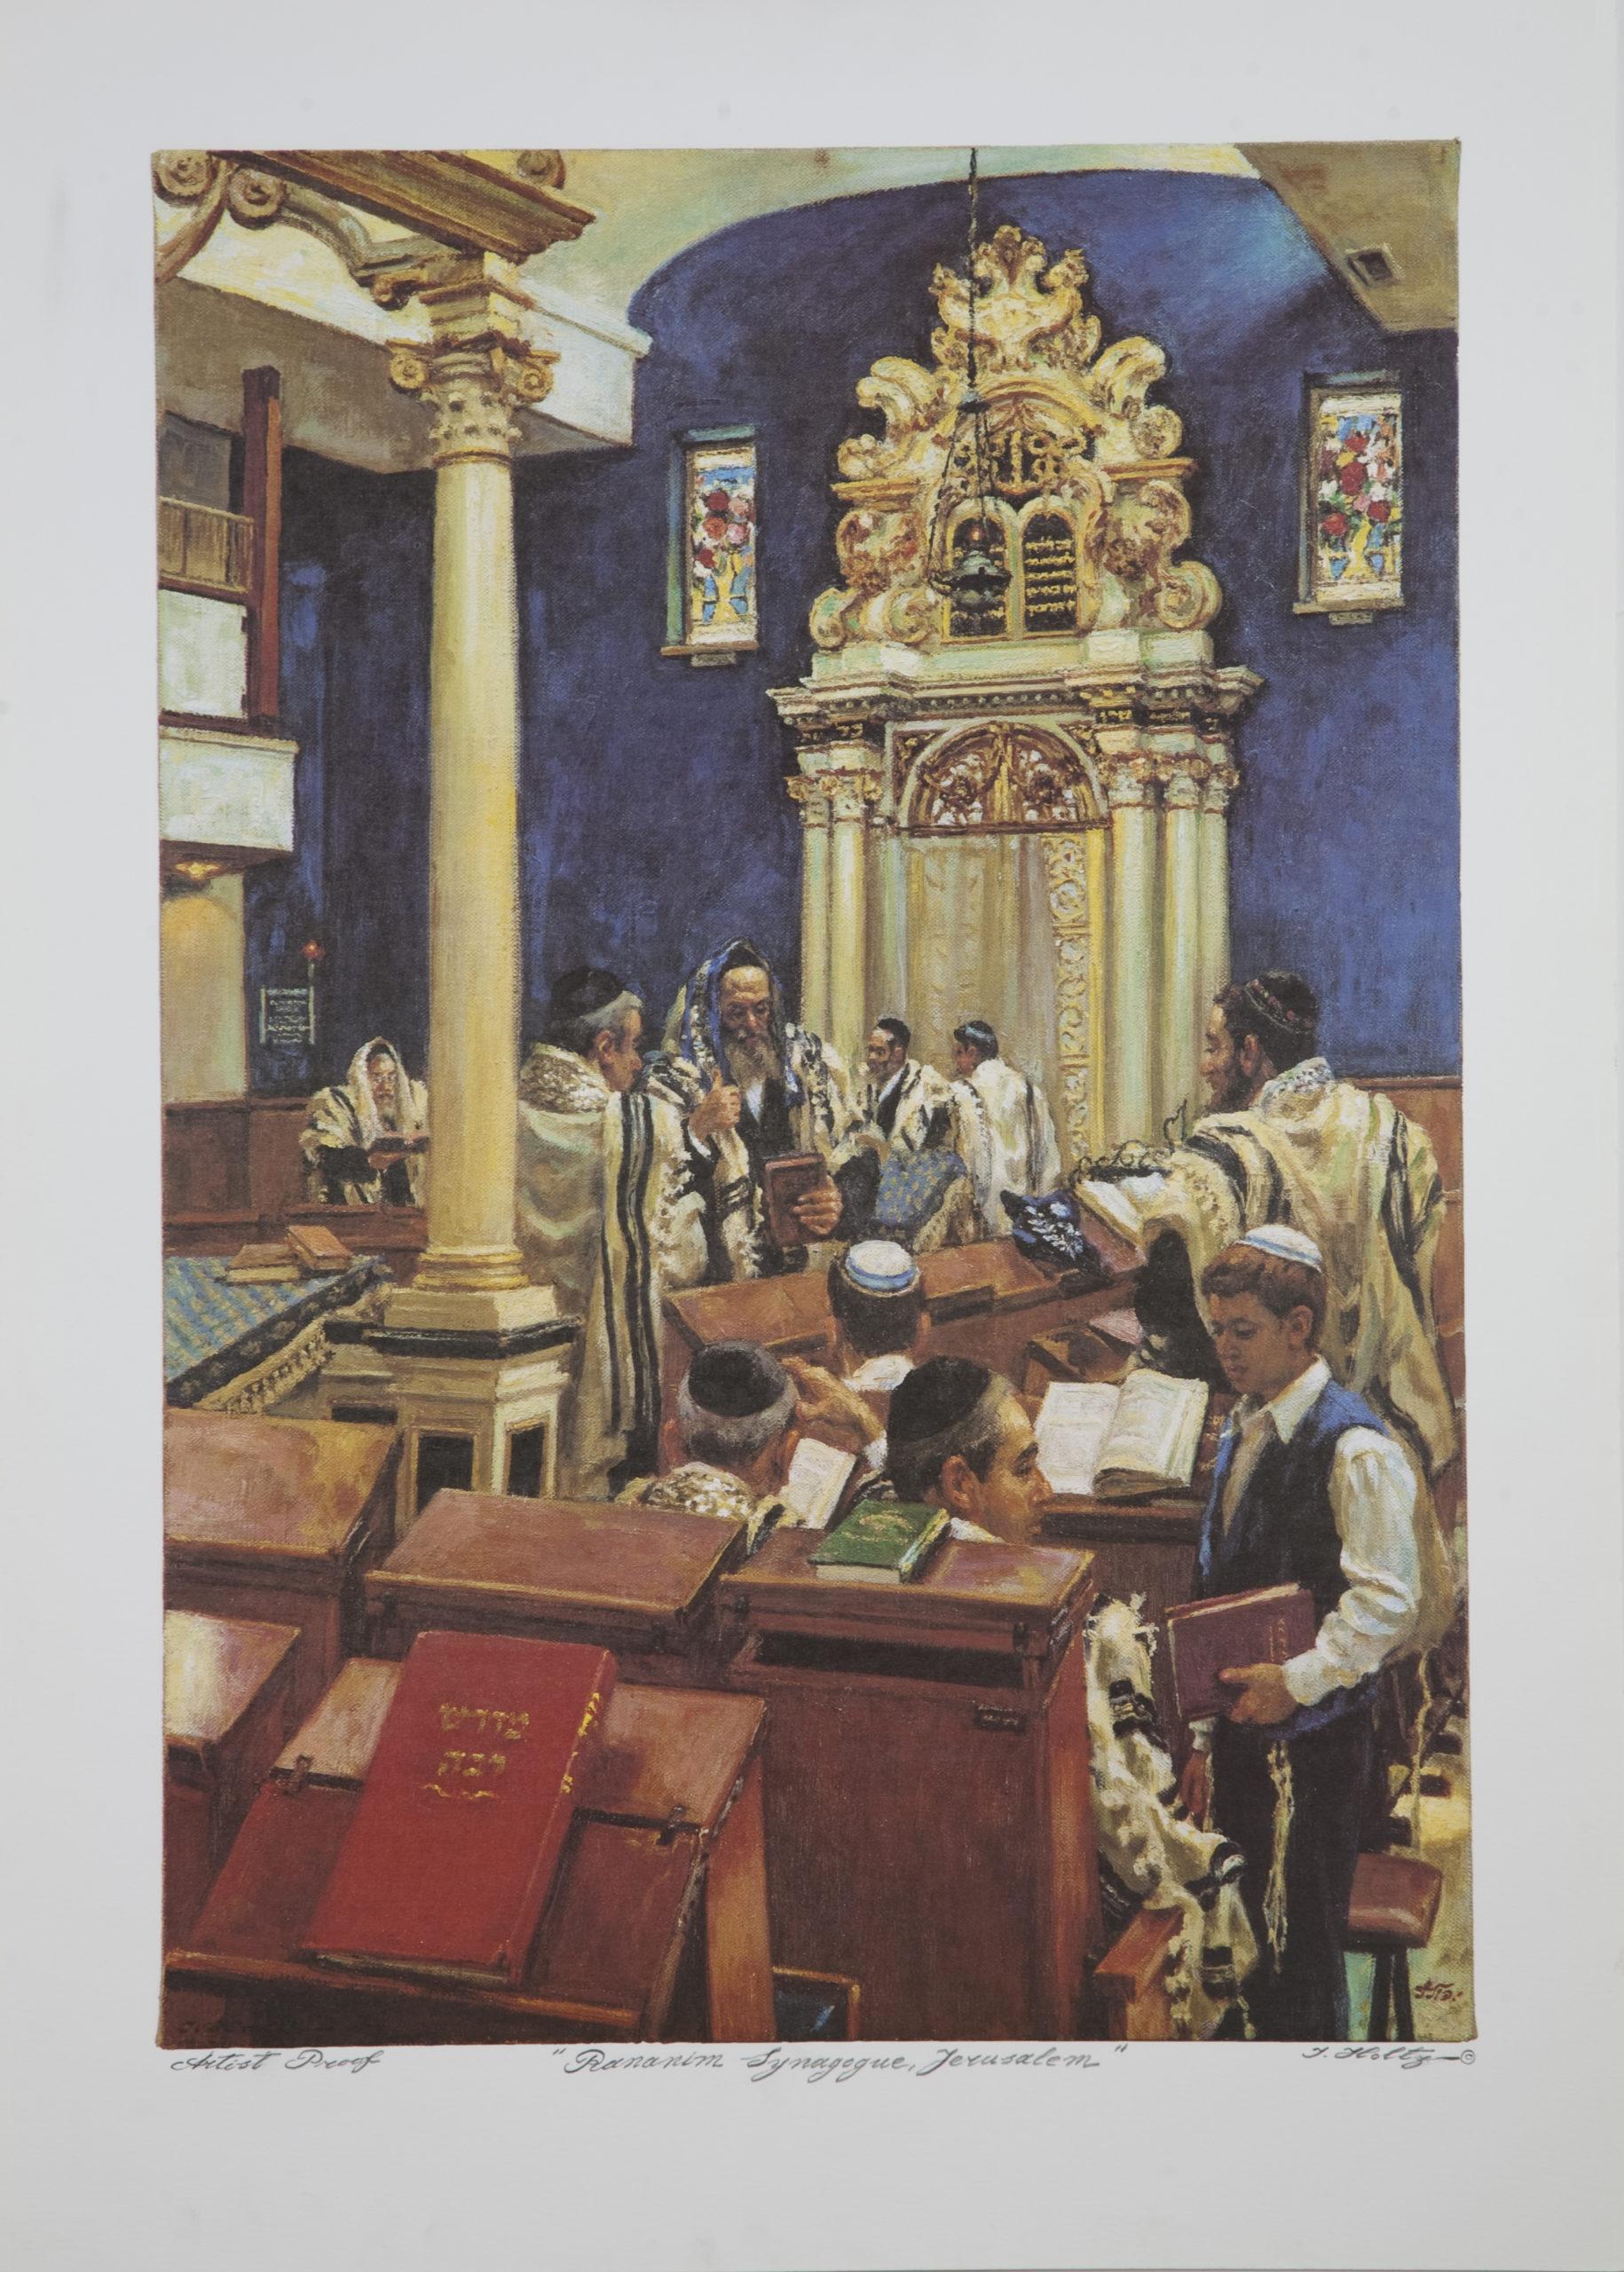 L14 Renanim Synagogue, Jerusalem - Color - Lithograph - 19.75 x 27.5 - No Frame - $500